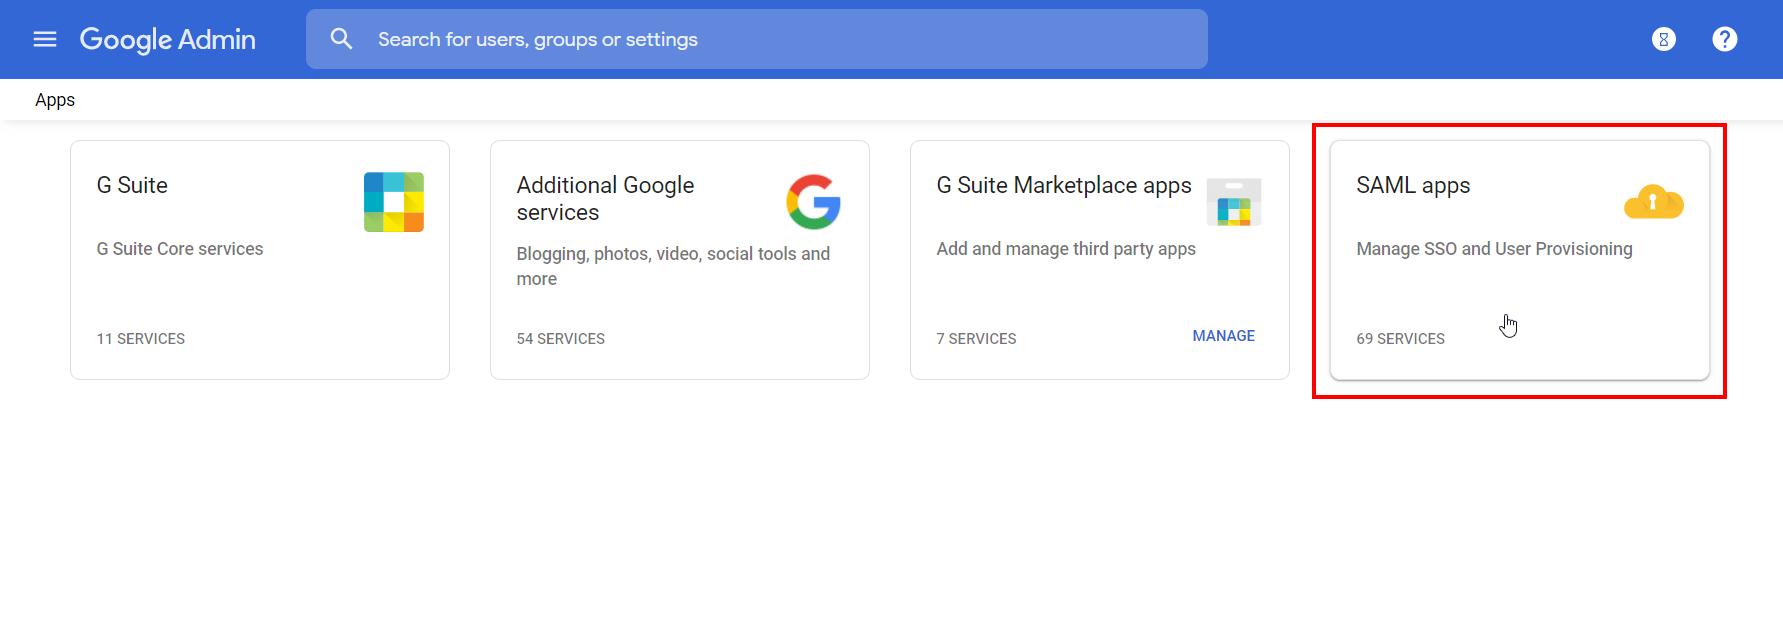 Google-apps SAML Apps